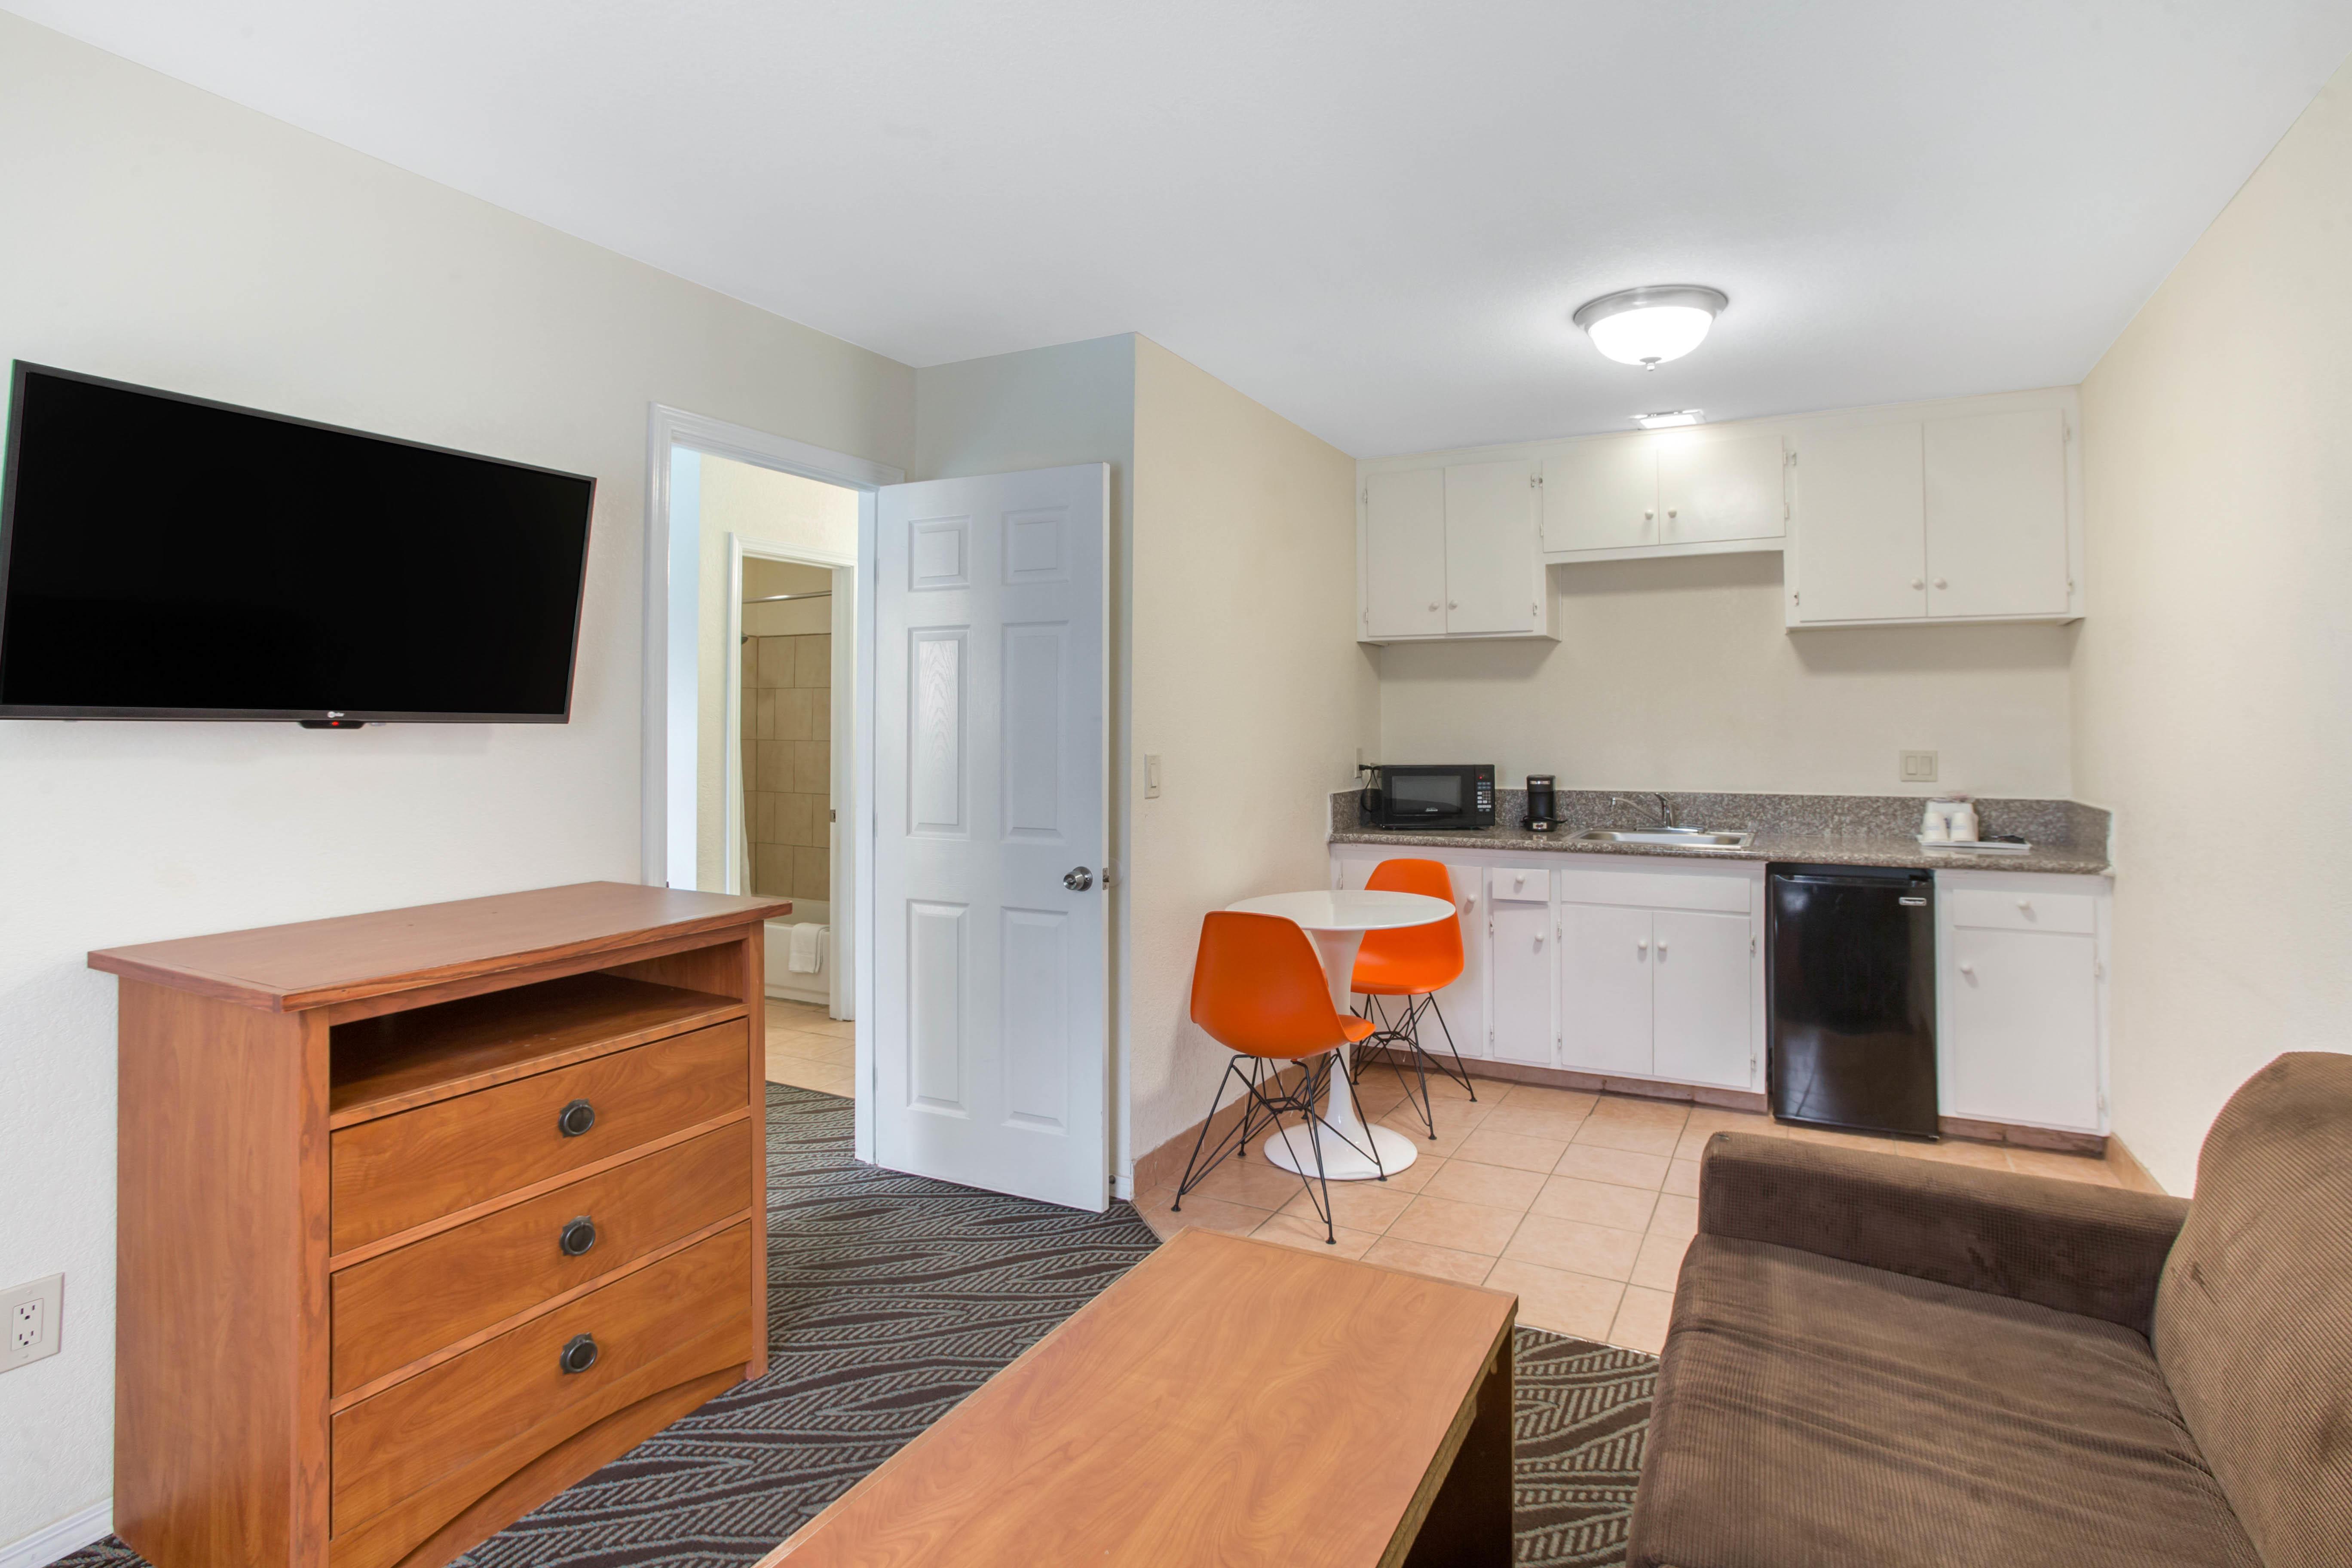 Howard Johnson by Wyndham Chula Vista San Diego Suite Hotel image 17